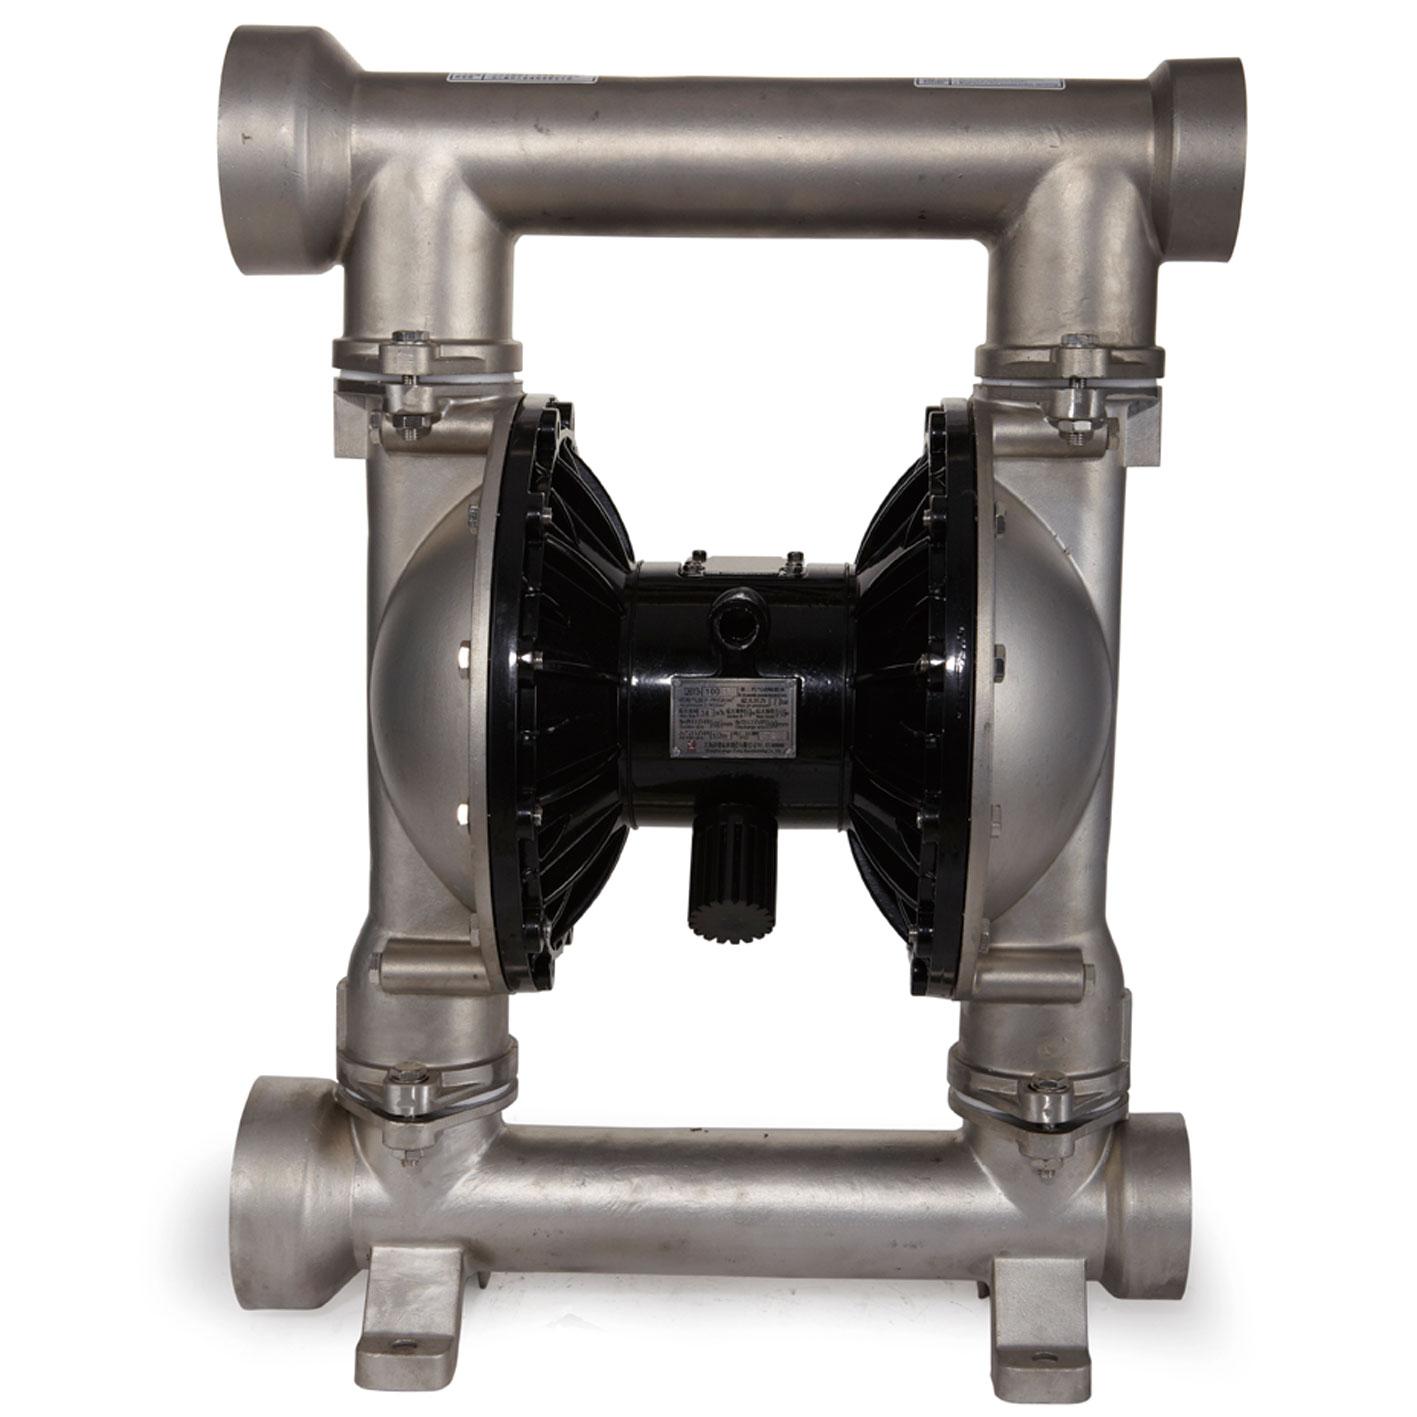 qby3-25a不锈钢气动隔膜泵型号材质参数图片